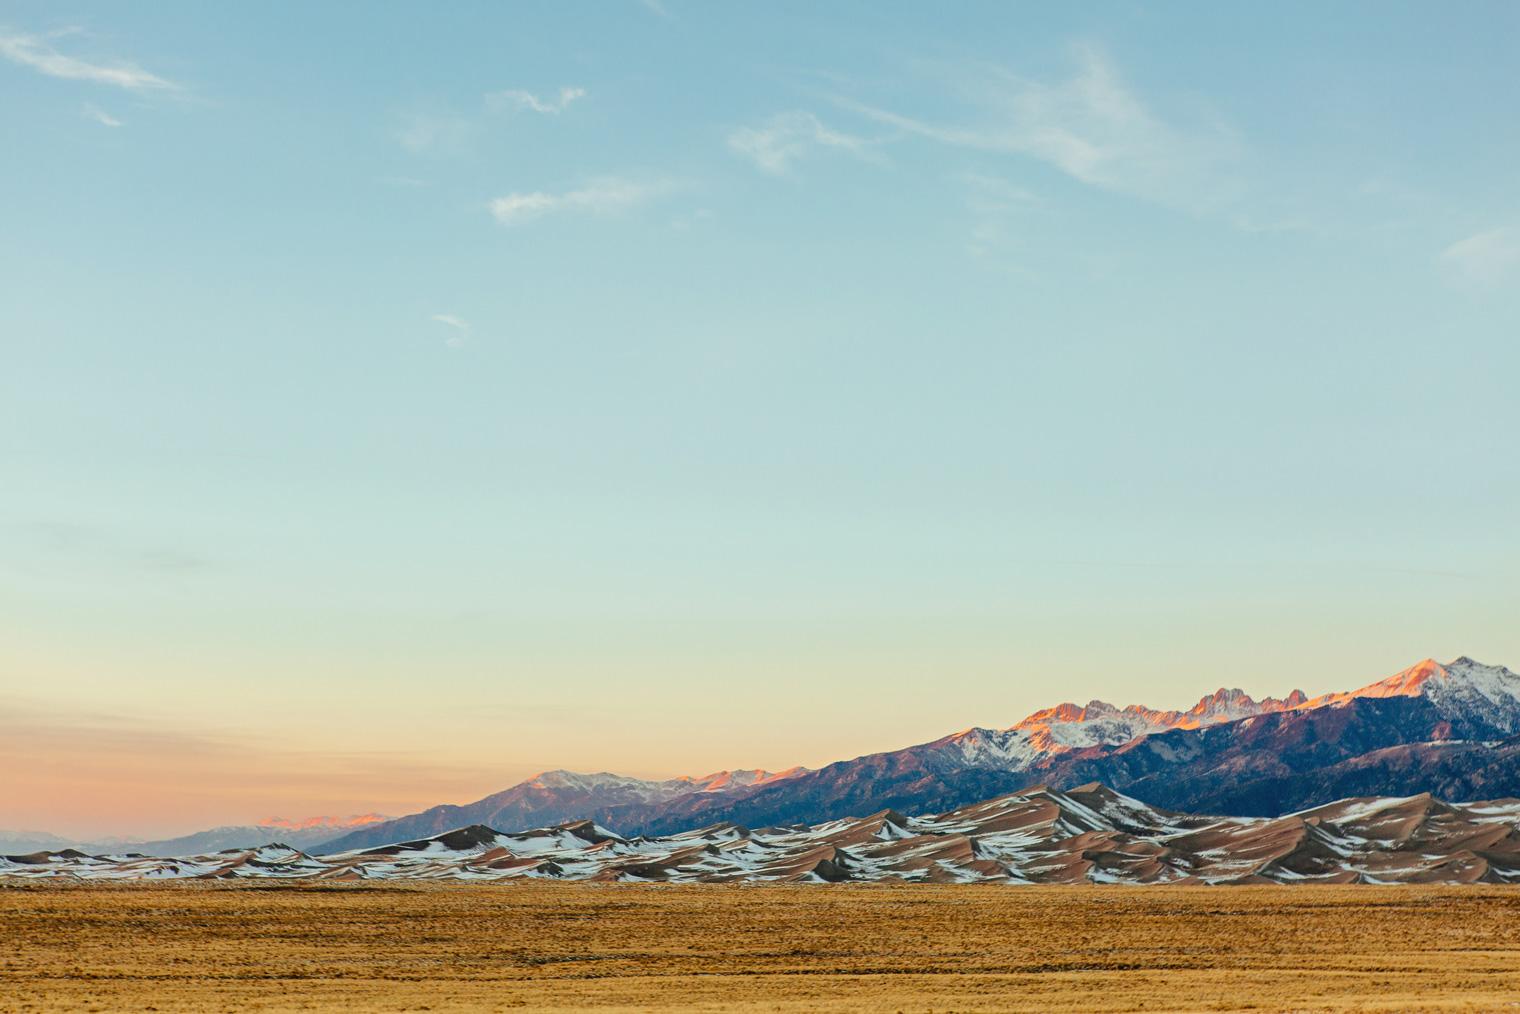 CindyGiovagnoli_Great_Sand_Dunes_National_Park_NPS_Colorado_roadtrip-016.jpg